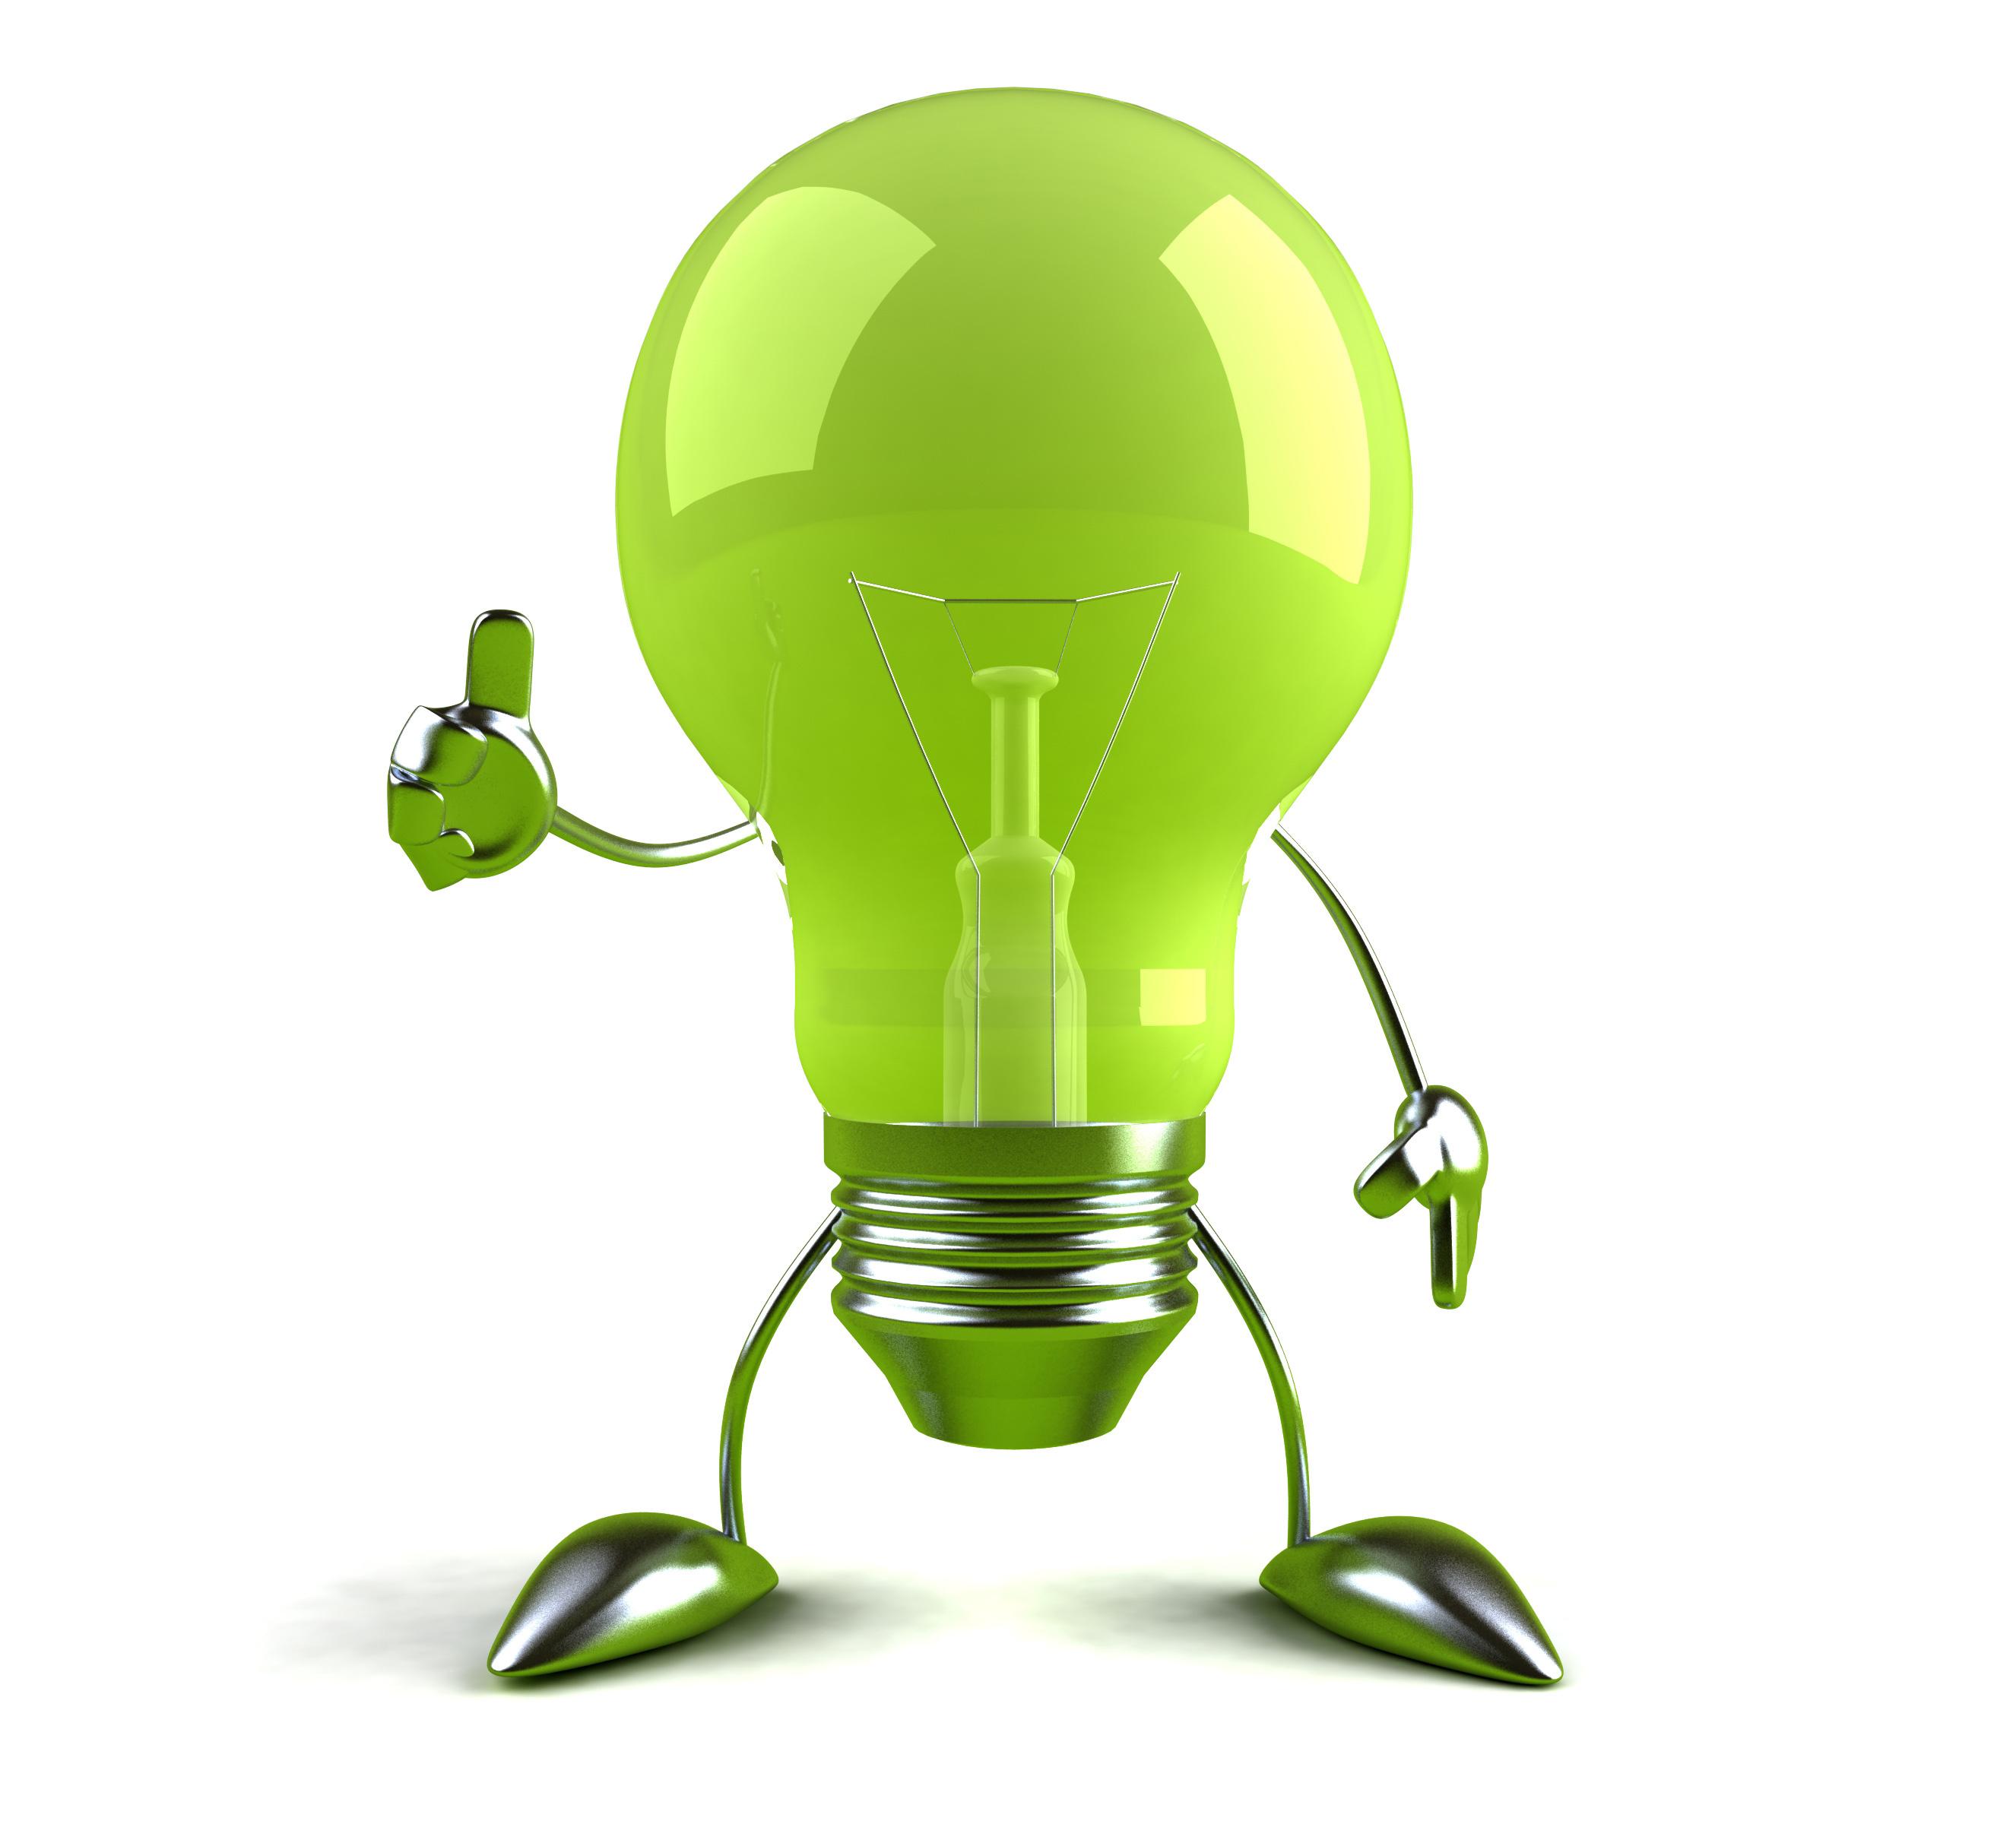 ampoule-electrecite-lumiere-idee-projet